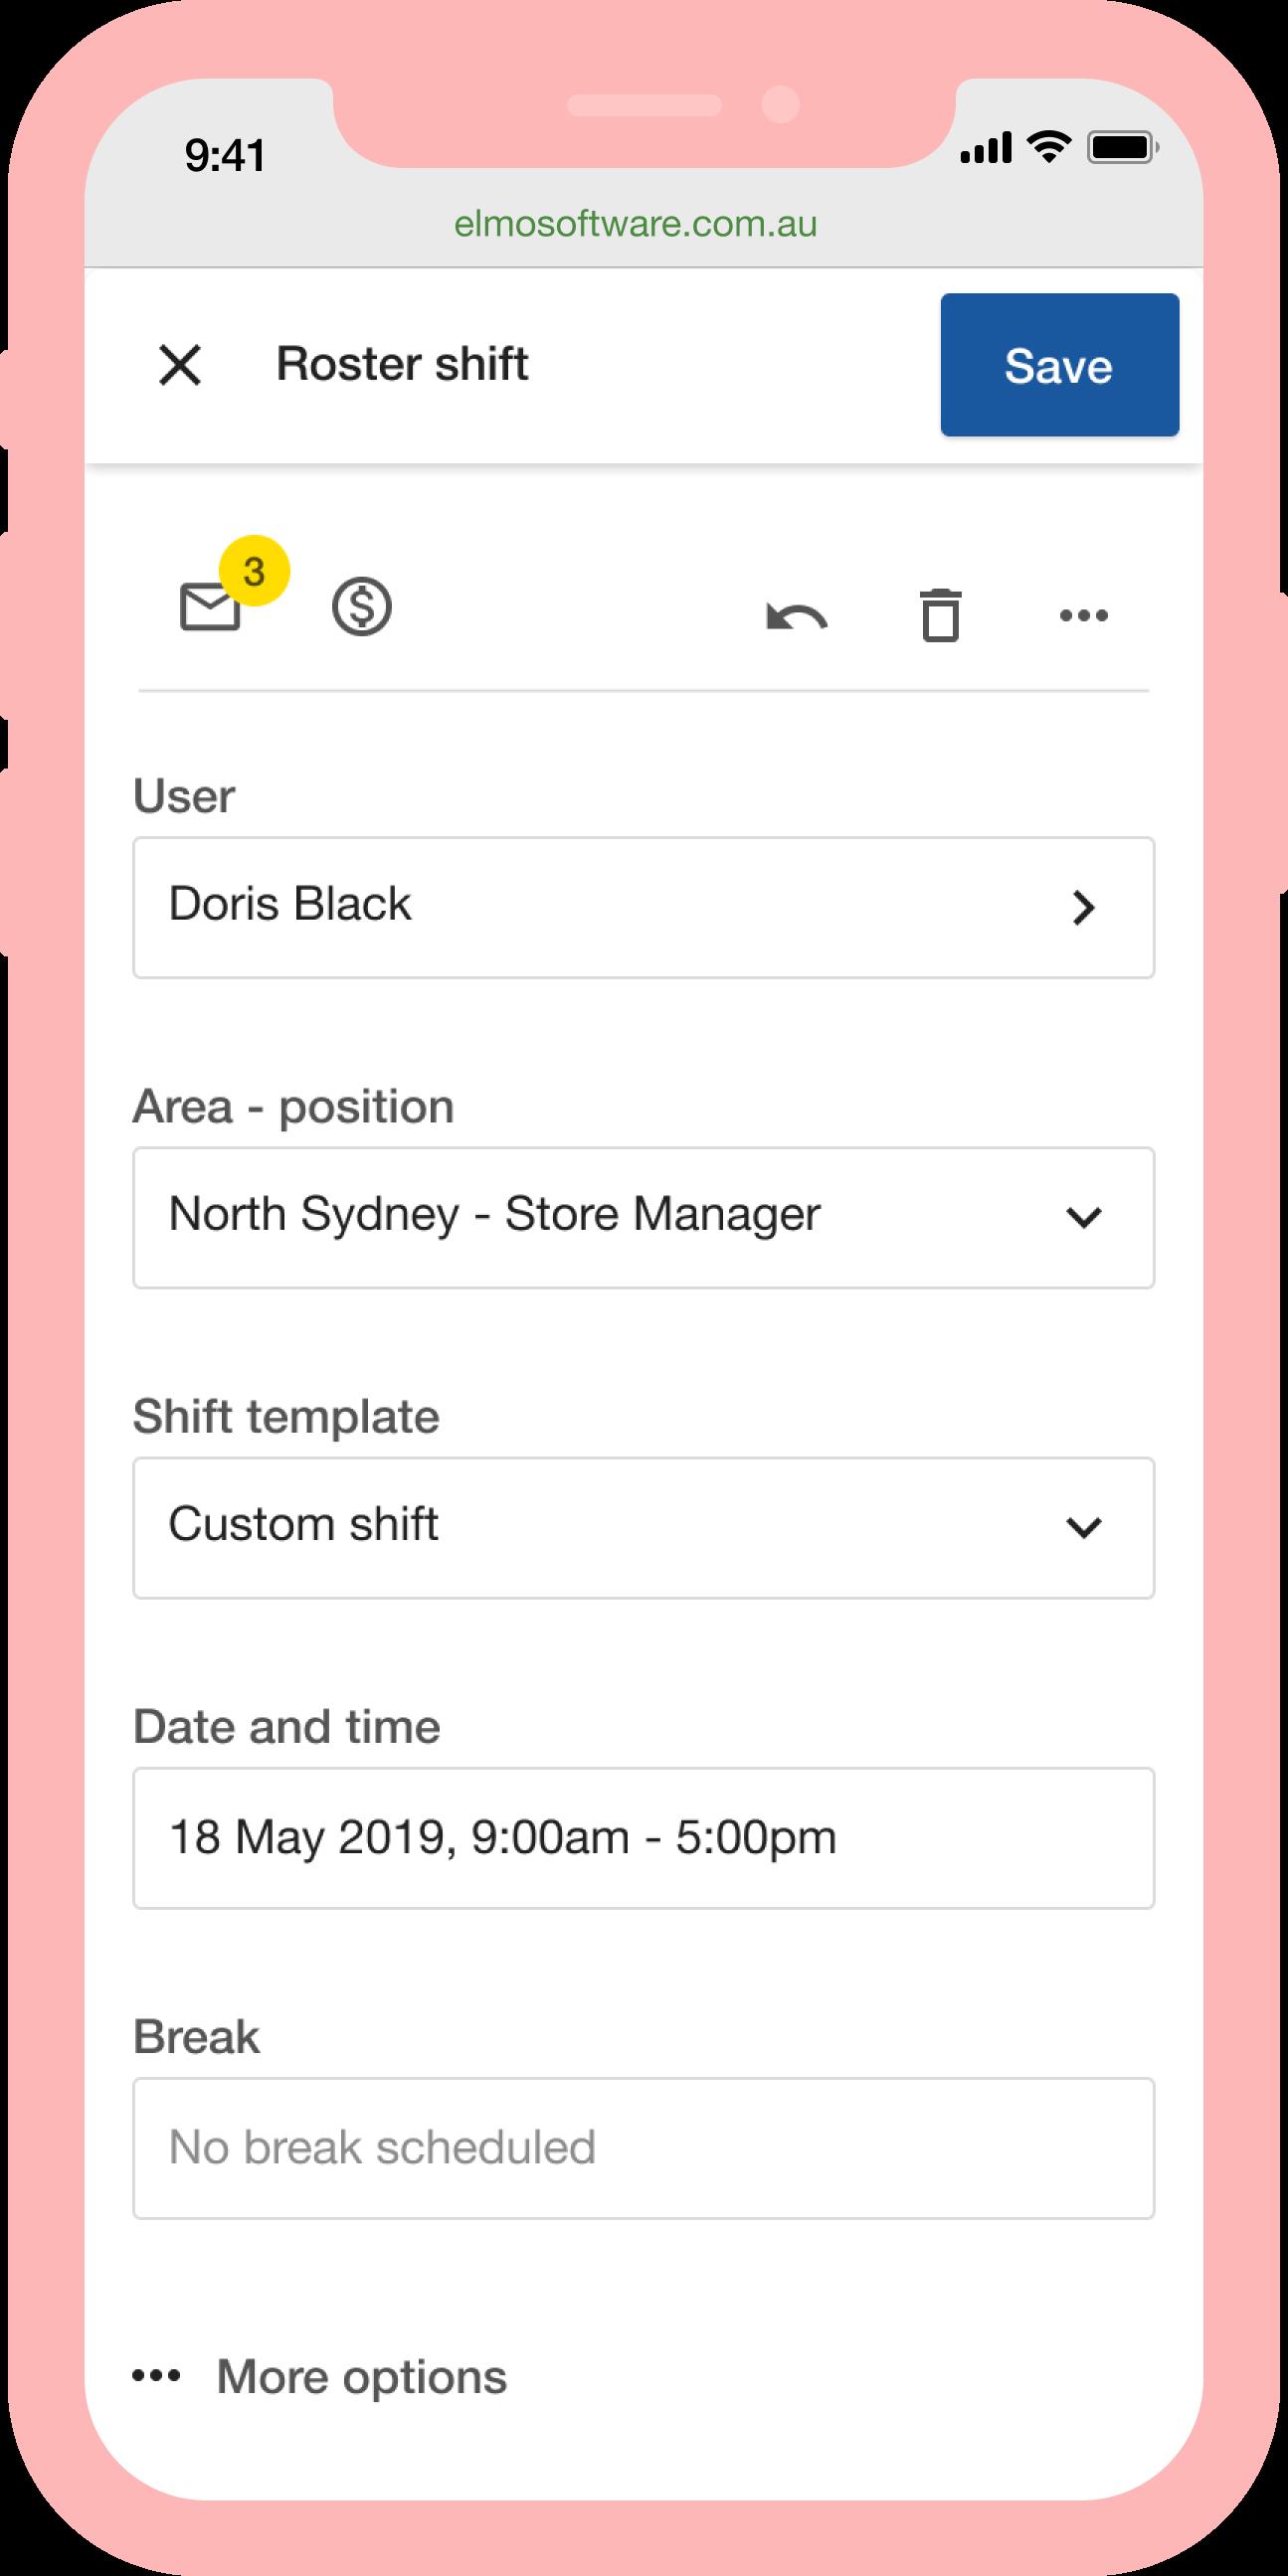 elmo-roster-time-attendance-mobile-roster-shift